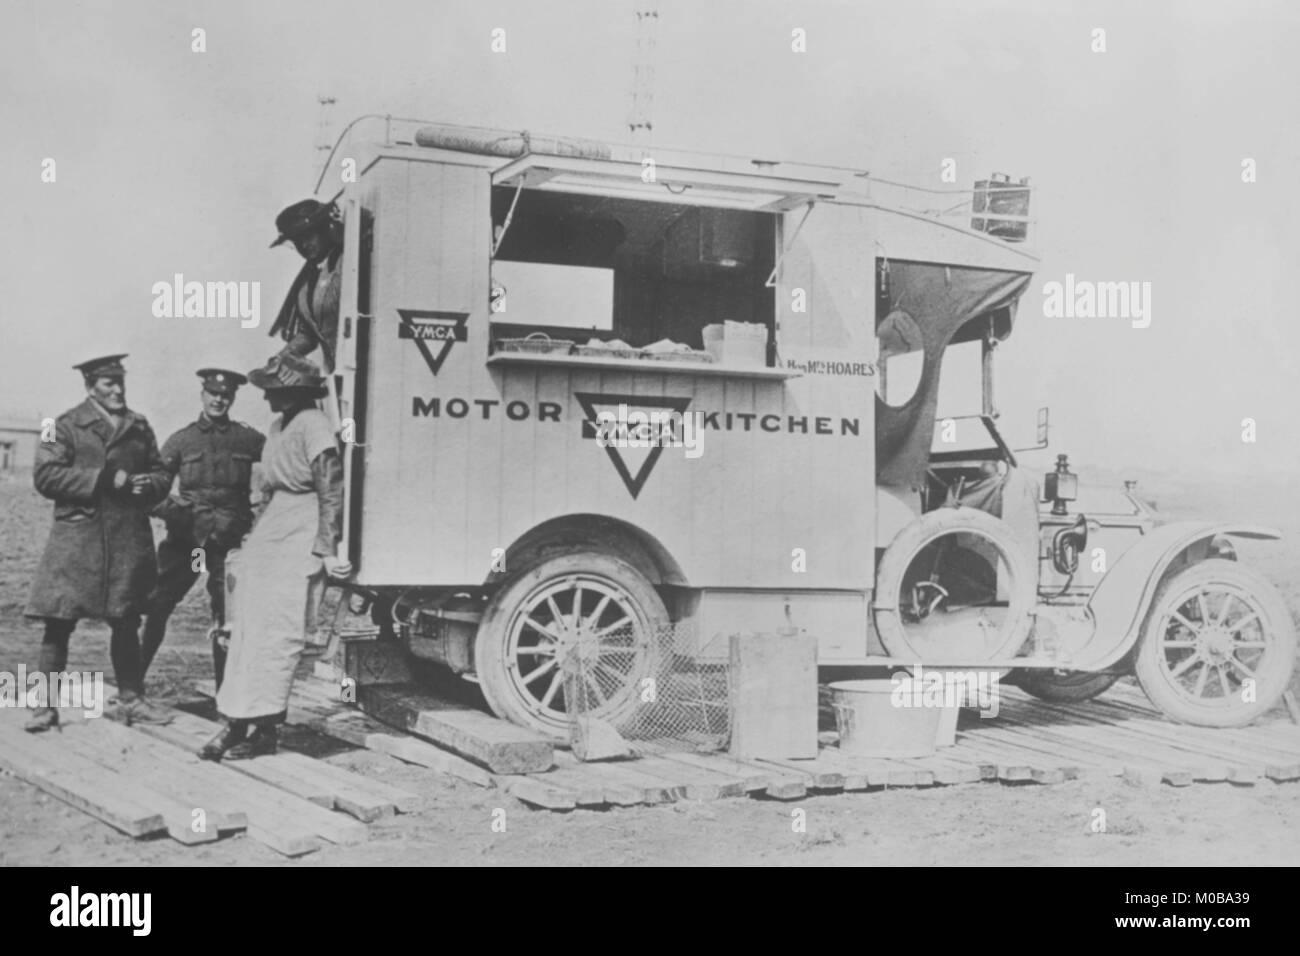 YMCA Army Motor Kitchen - Stock Image